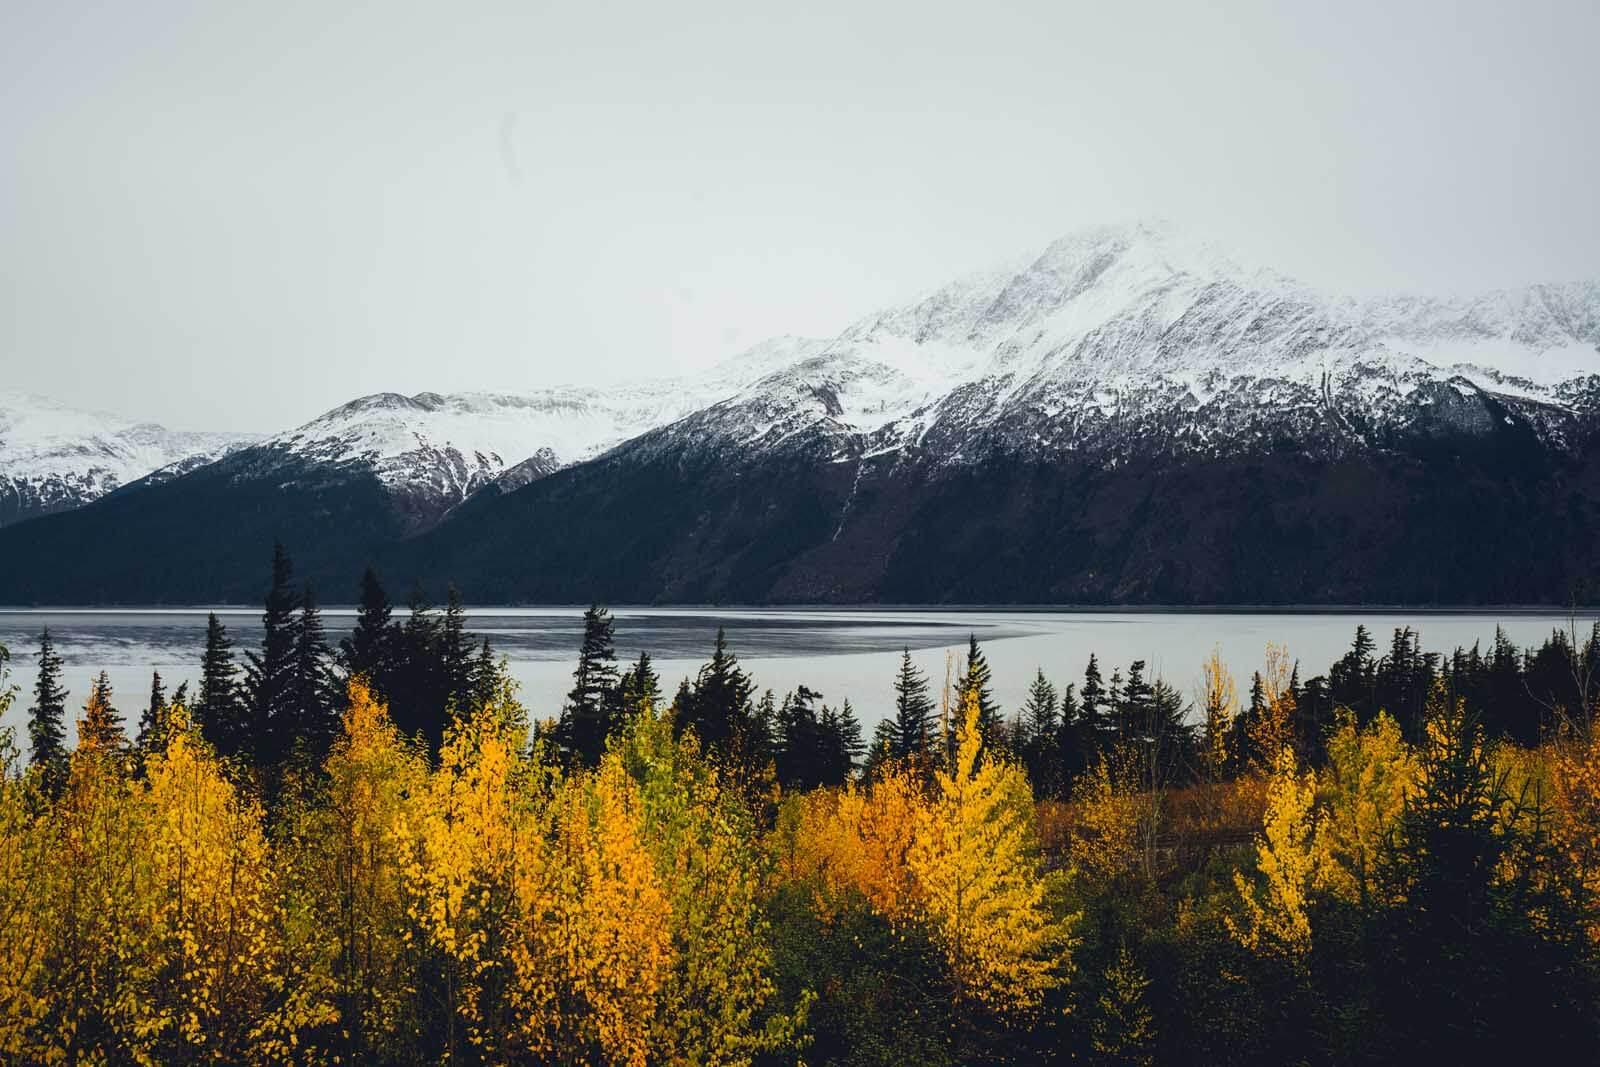 beautiful stop along the Seward Highway in Alaska